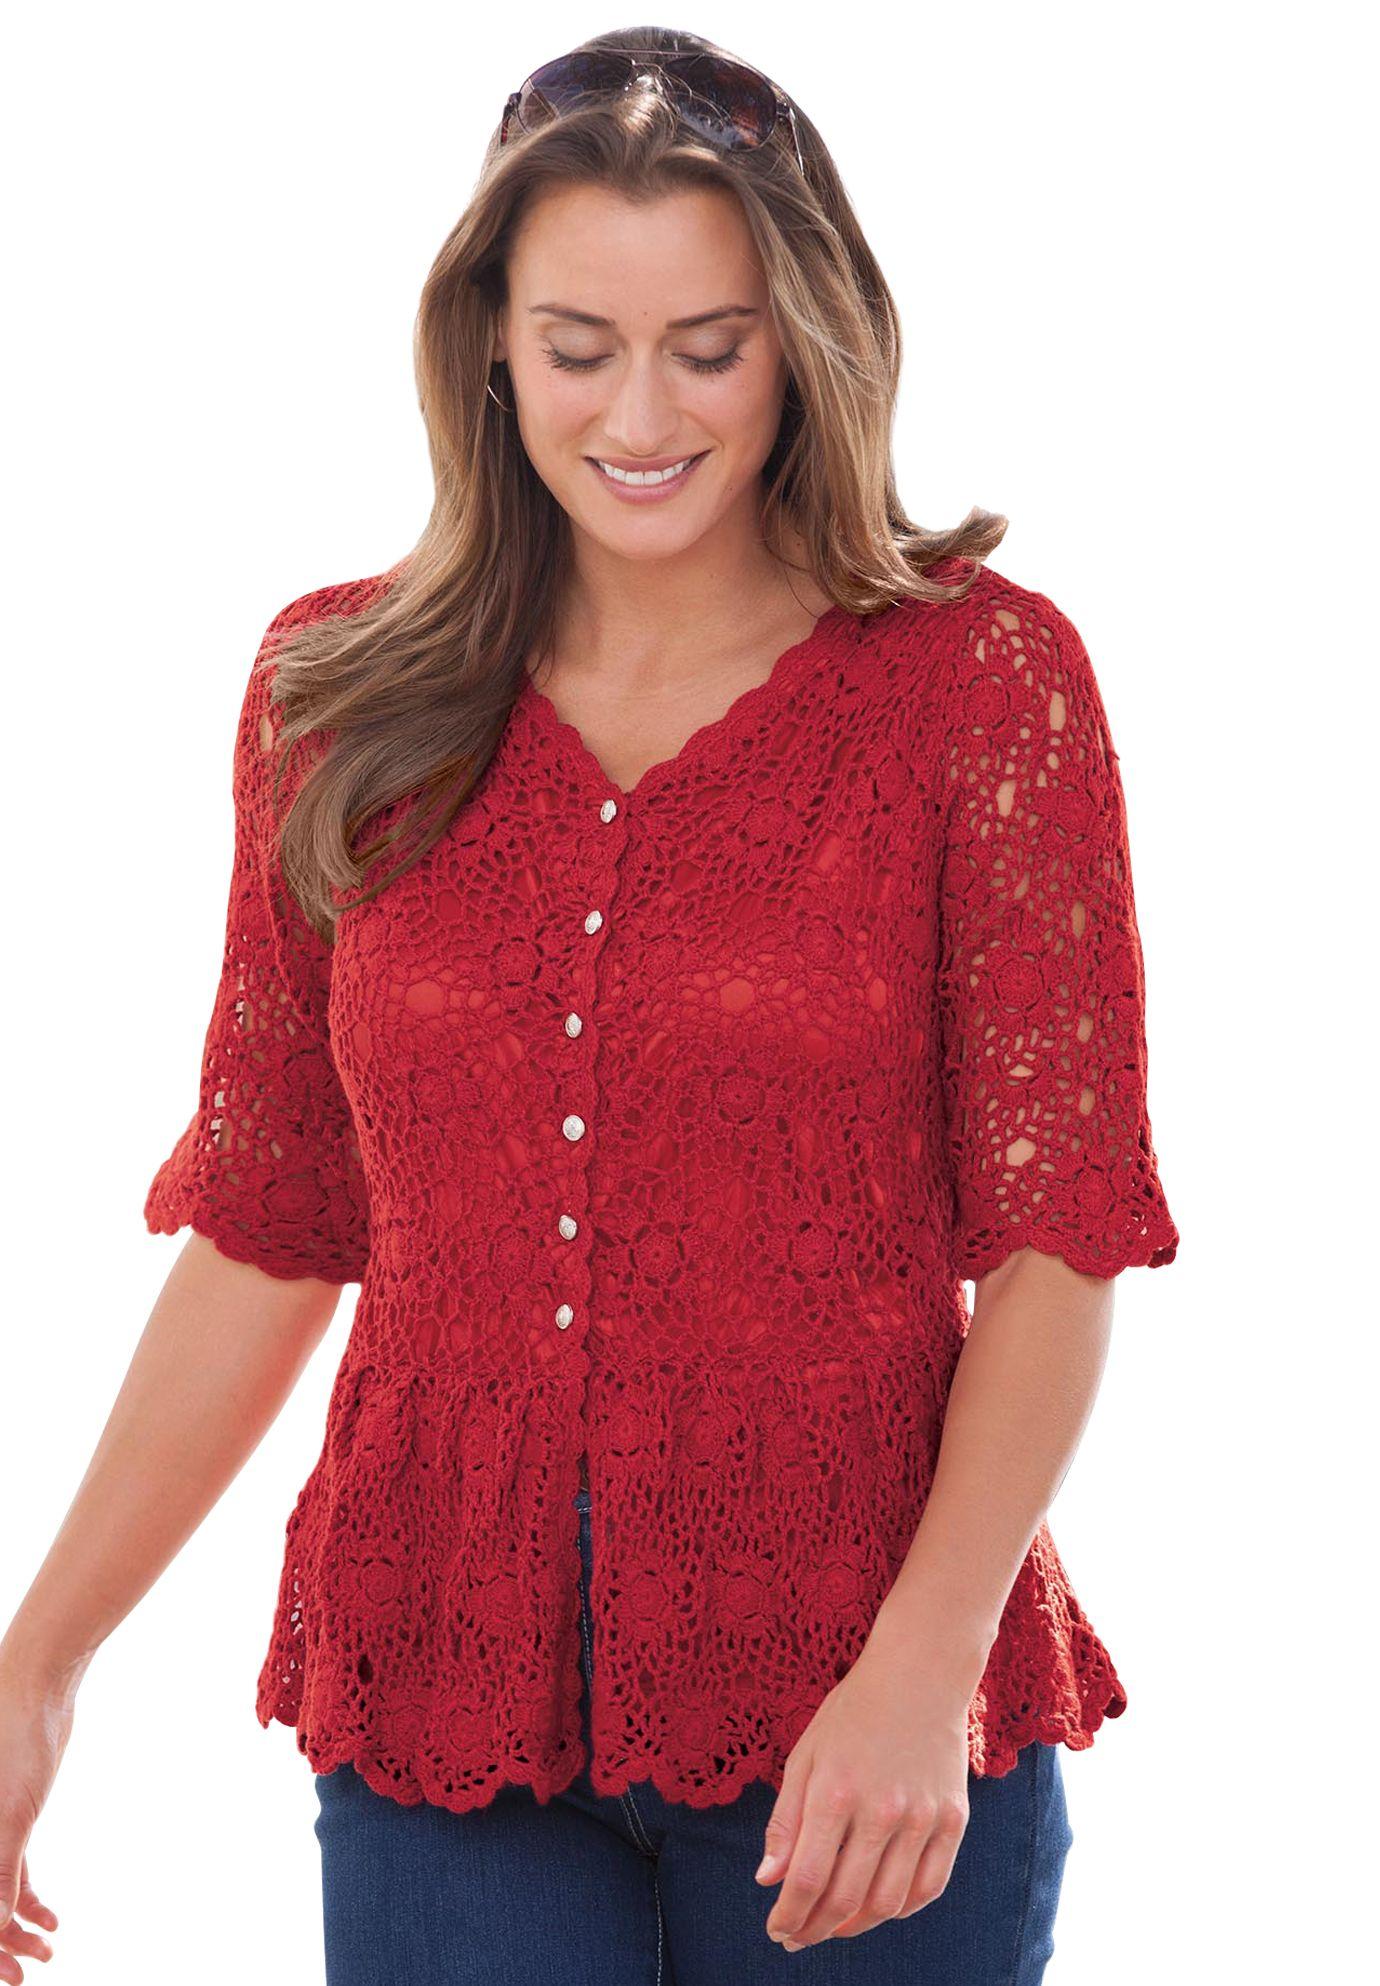 Crochet Cardigan | Plus Size Sweaters & Cardigans | Jessica London ...